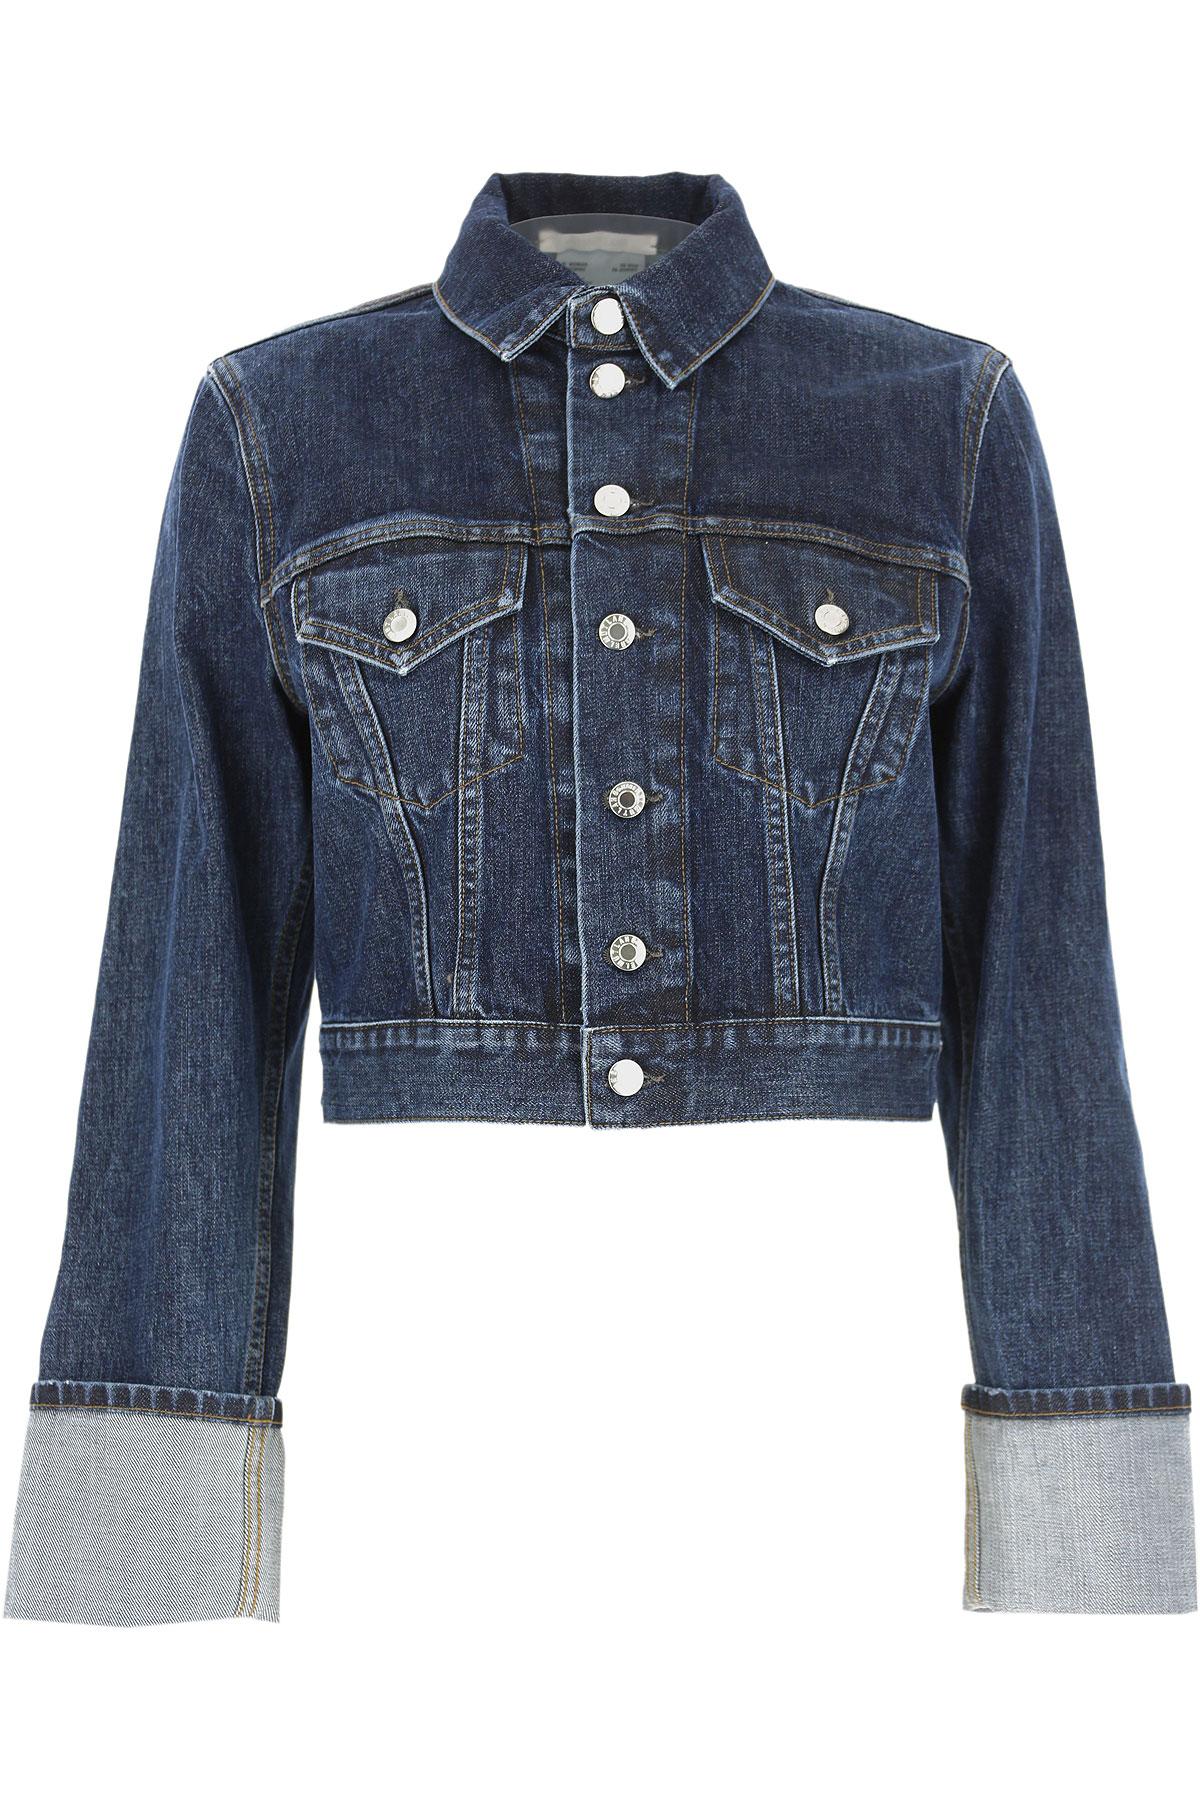 Helmut Lang Jacket for Women On Sale, Dark Blue Denim, Cotton, 2019, 6 8